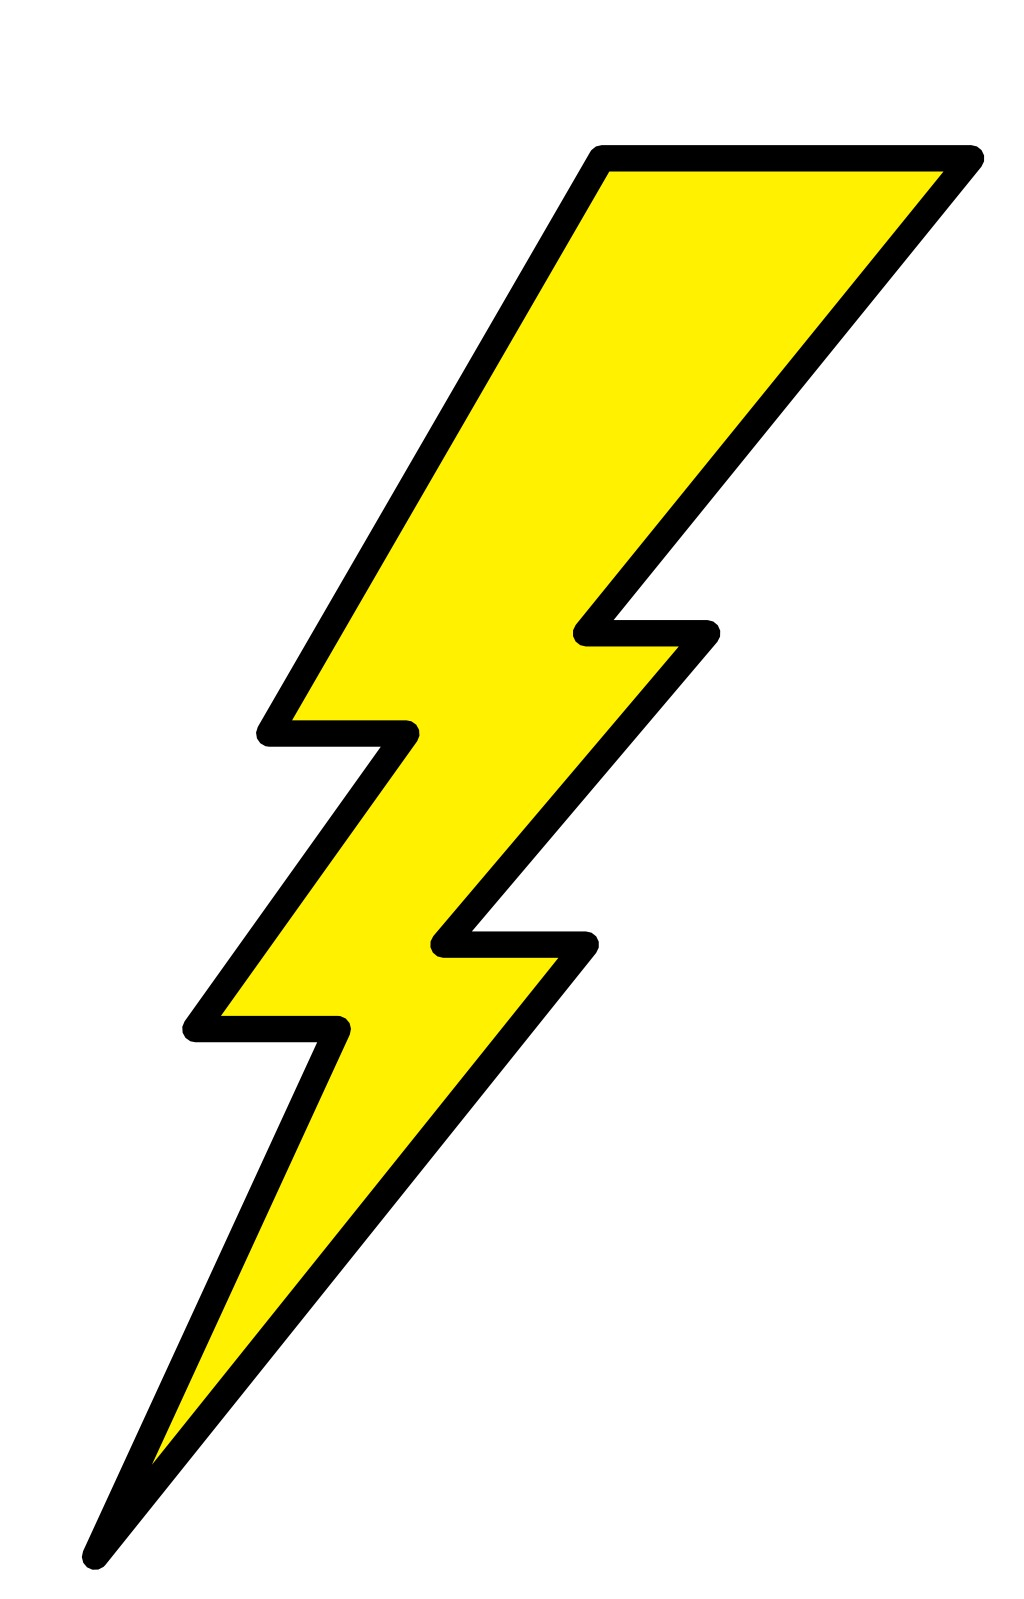 ressources  u00c9ducatives libres data abuledu org les lightning bolt clipart black lightning bolt clip art free